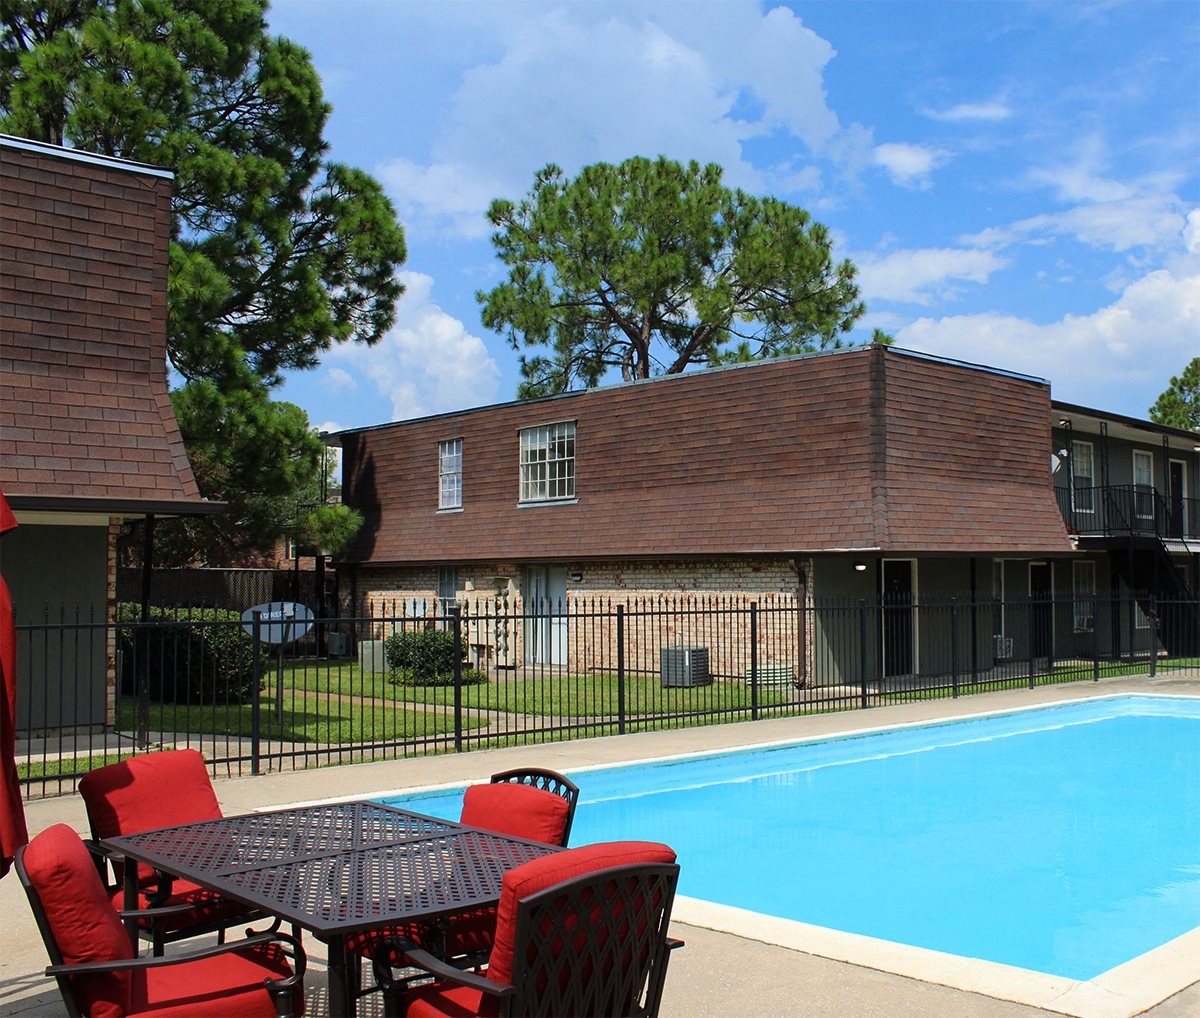 Copper Ridge Aparments Baton Rouge Louisiana Latter and Blum Property Management